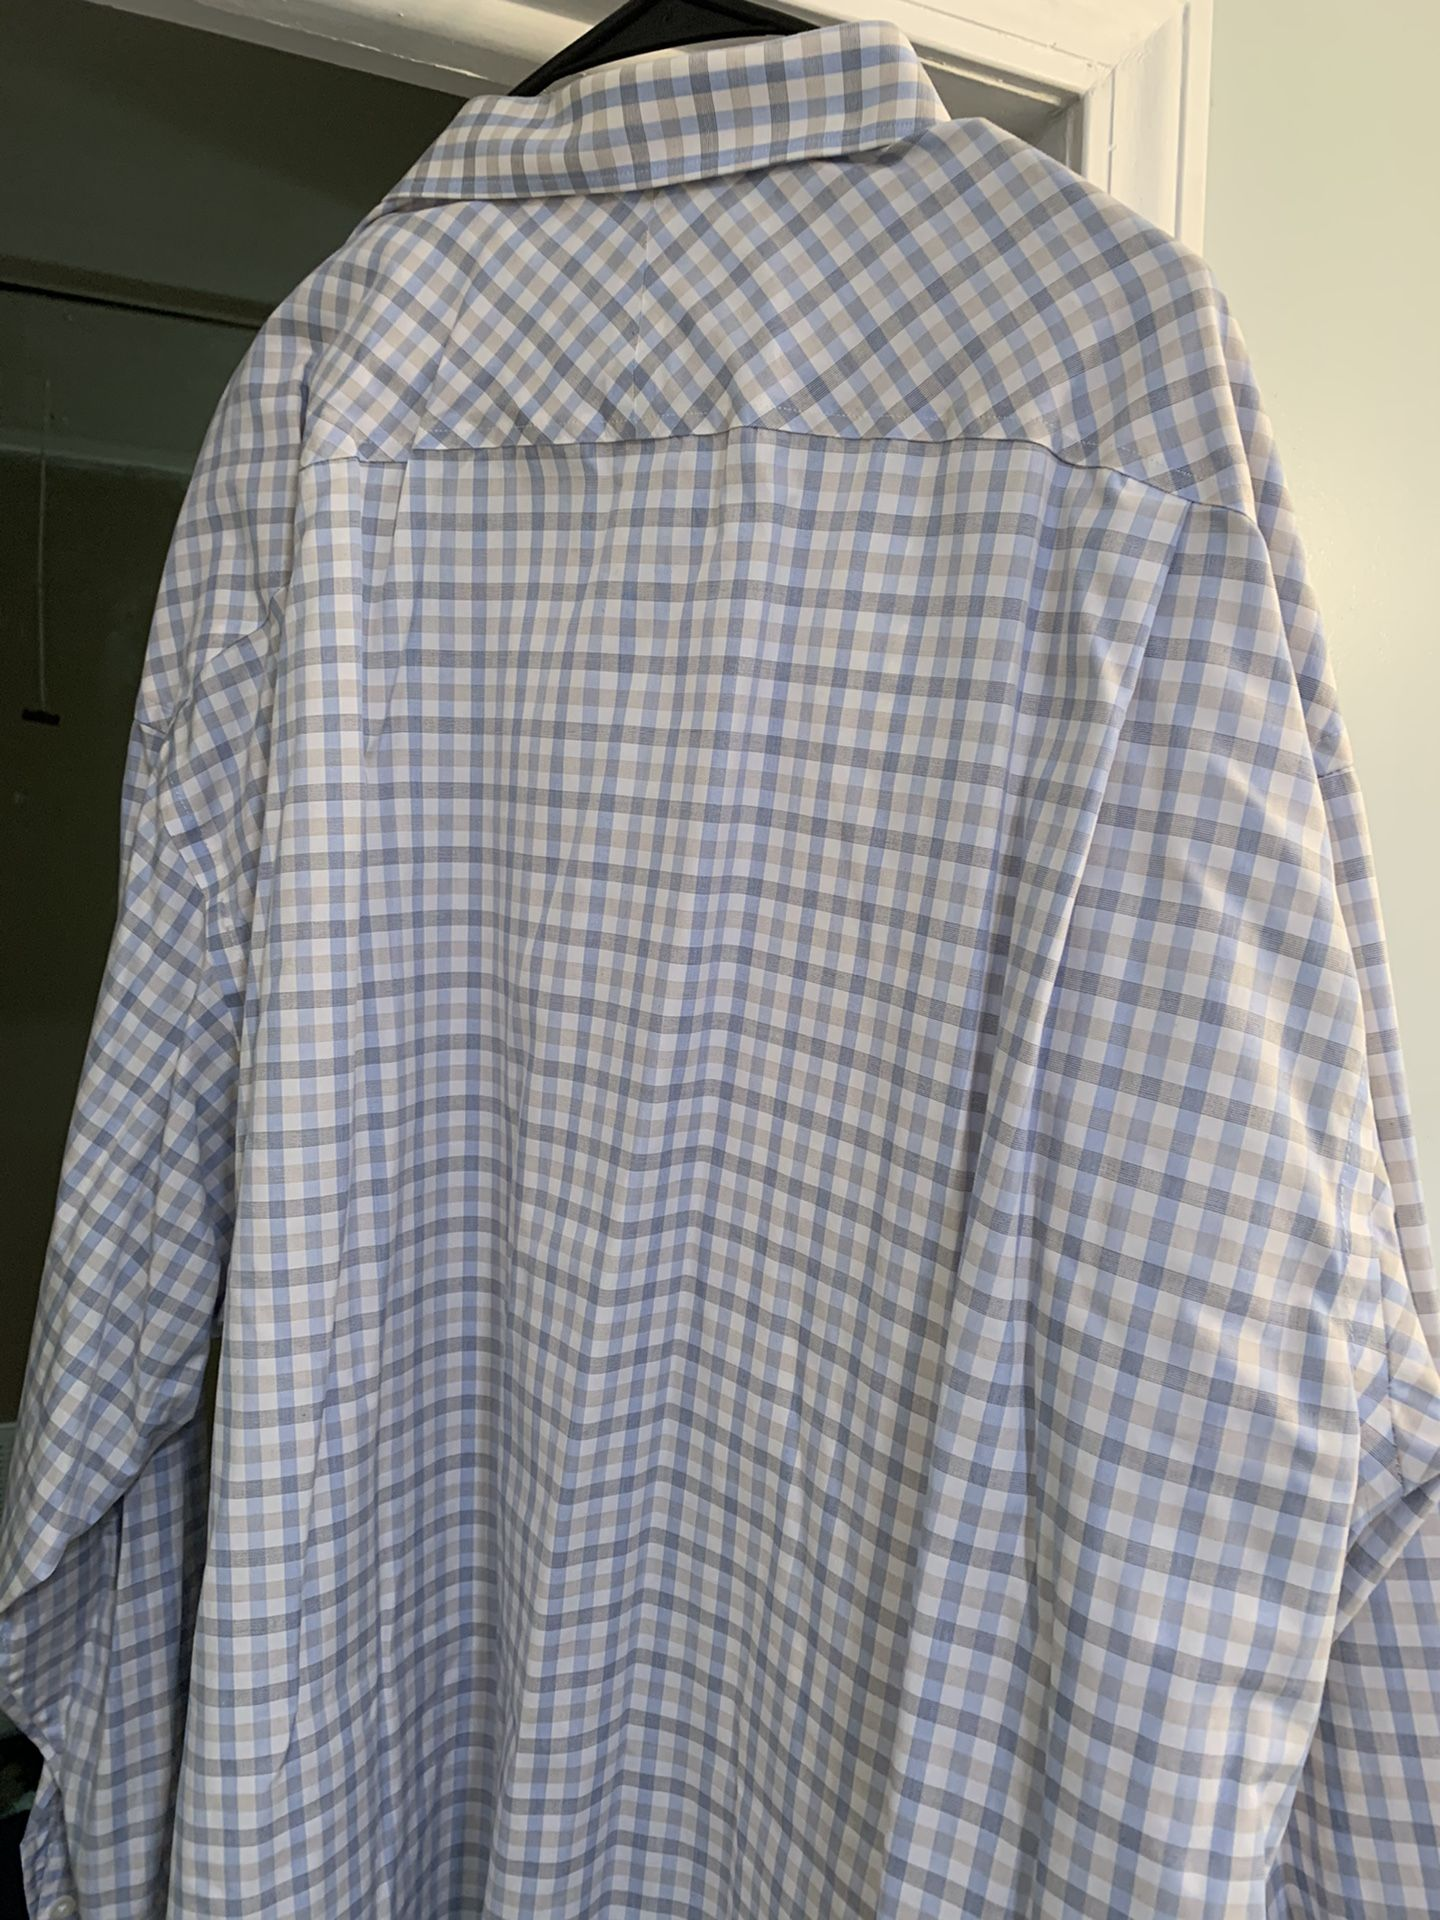 Joseph Abboud 3XL BLUE, Tan And White